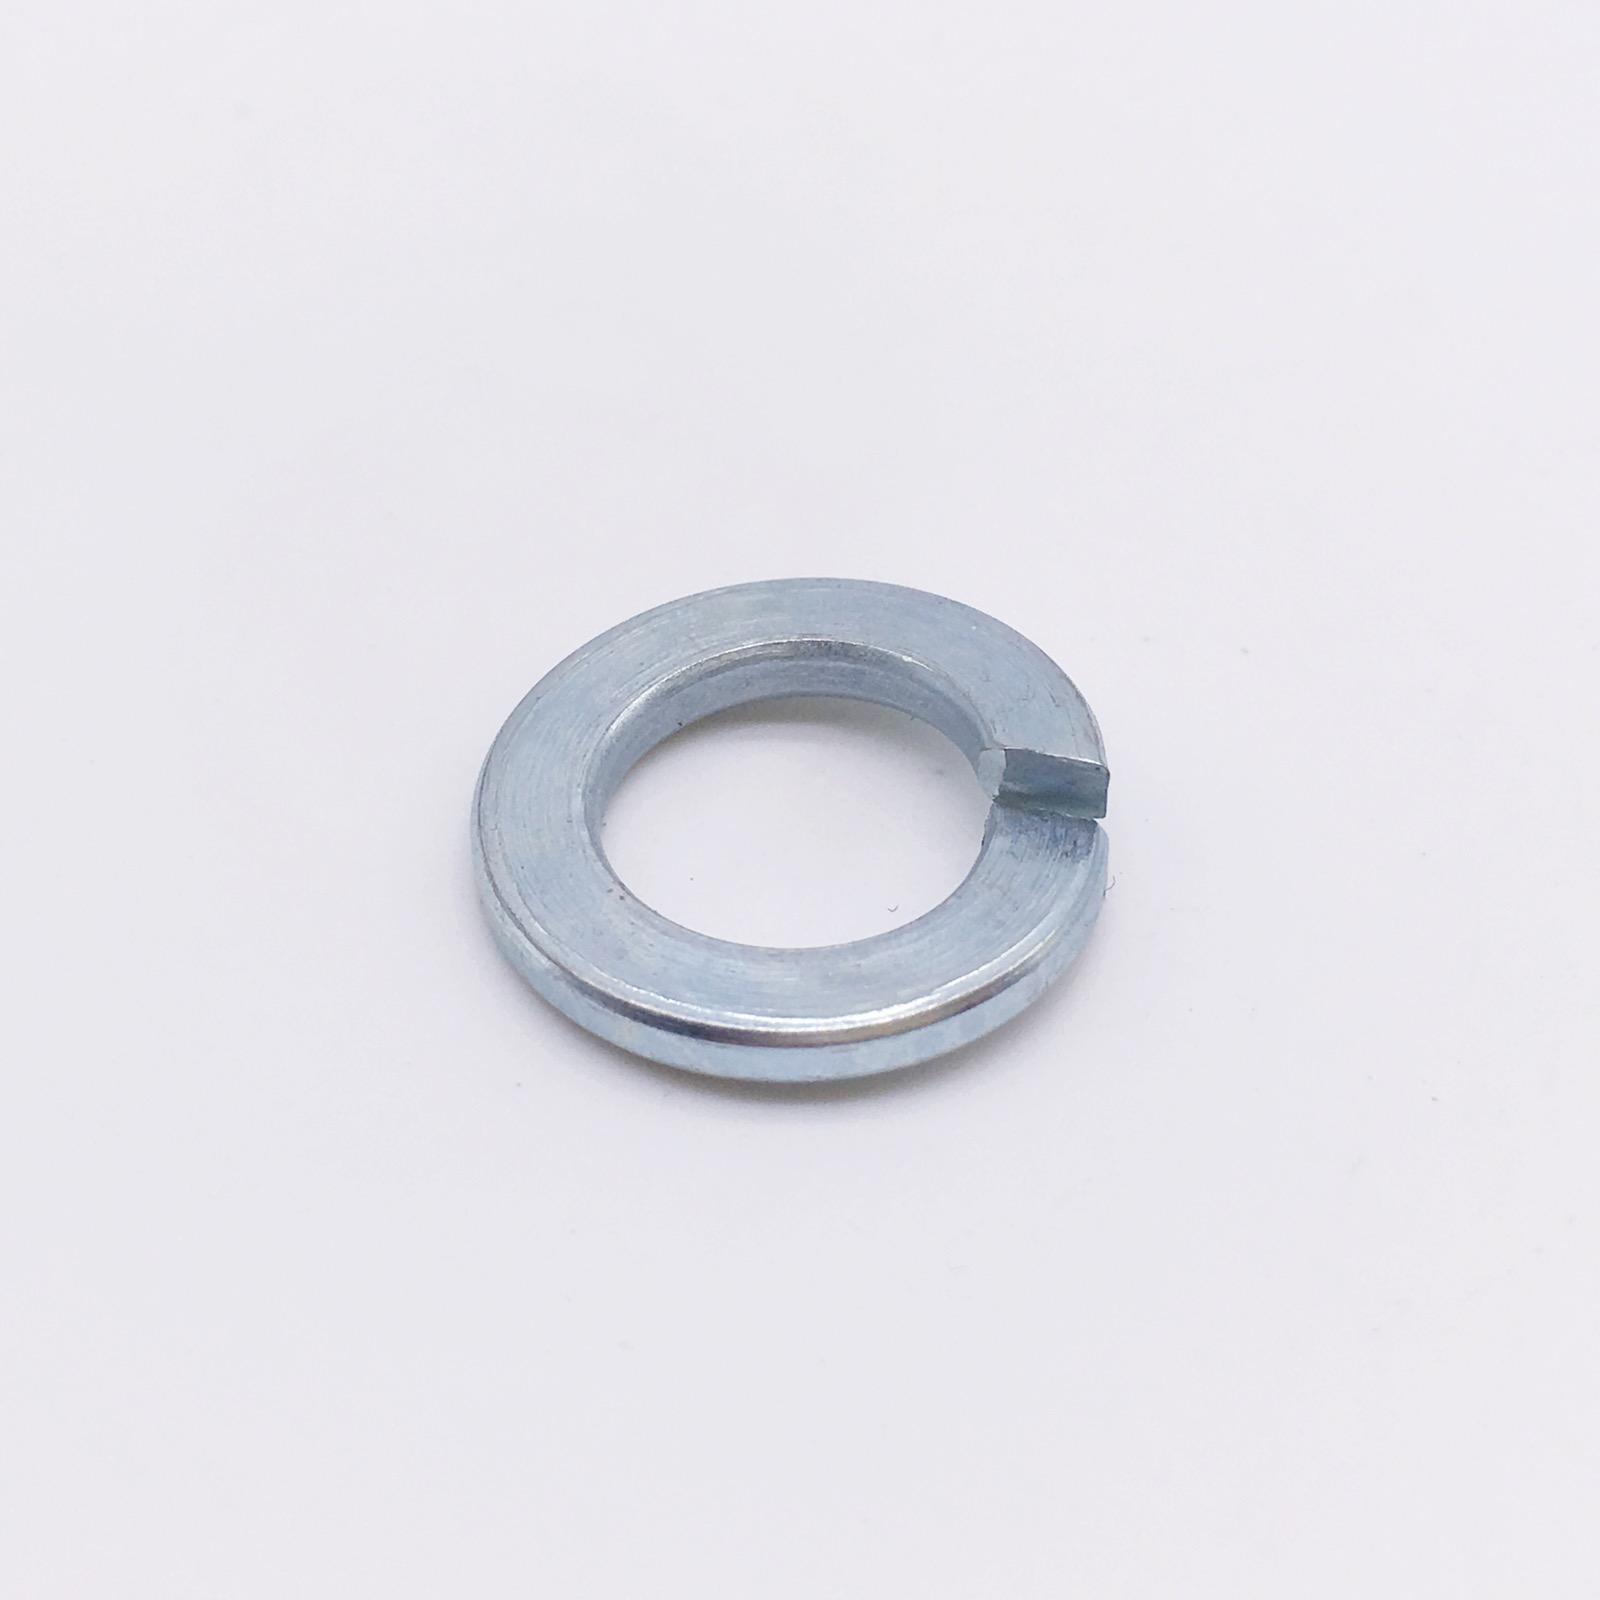 M2.5 spring washer split washer din127 carbon steel washer galvanized 5000 pieces(China (Mainland))